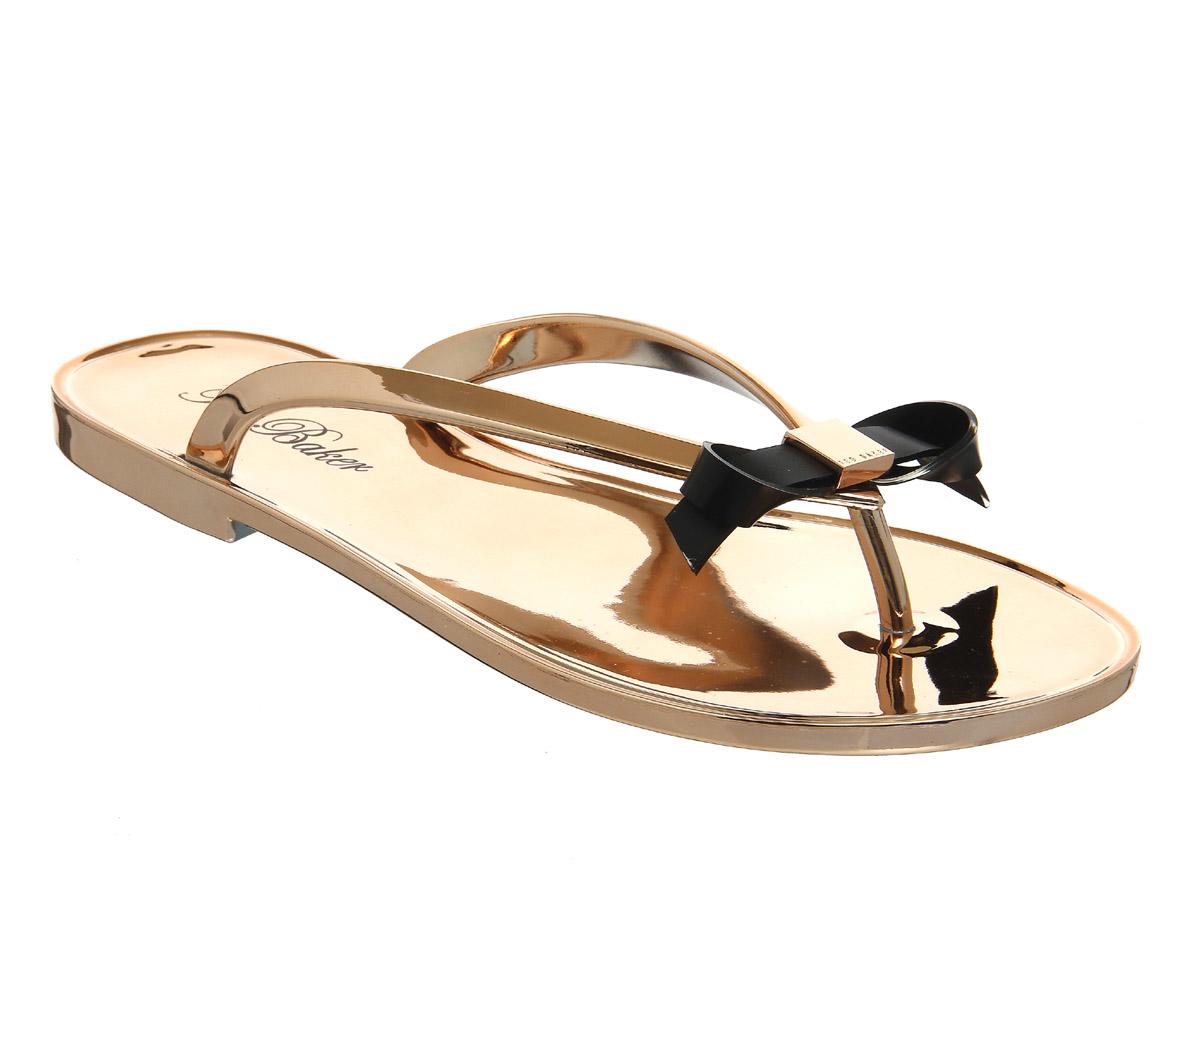 c8eab6008 Lyst - Ted Baker Heebei Sandals in Metallic